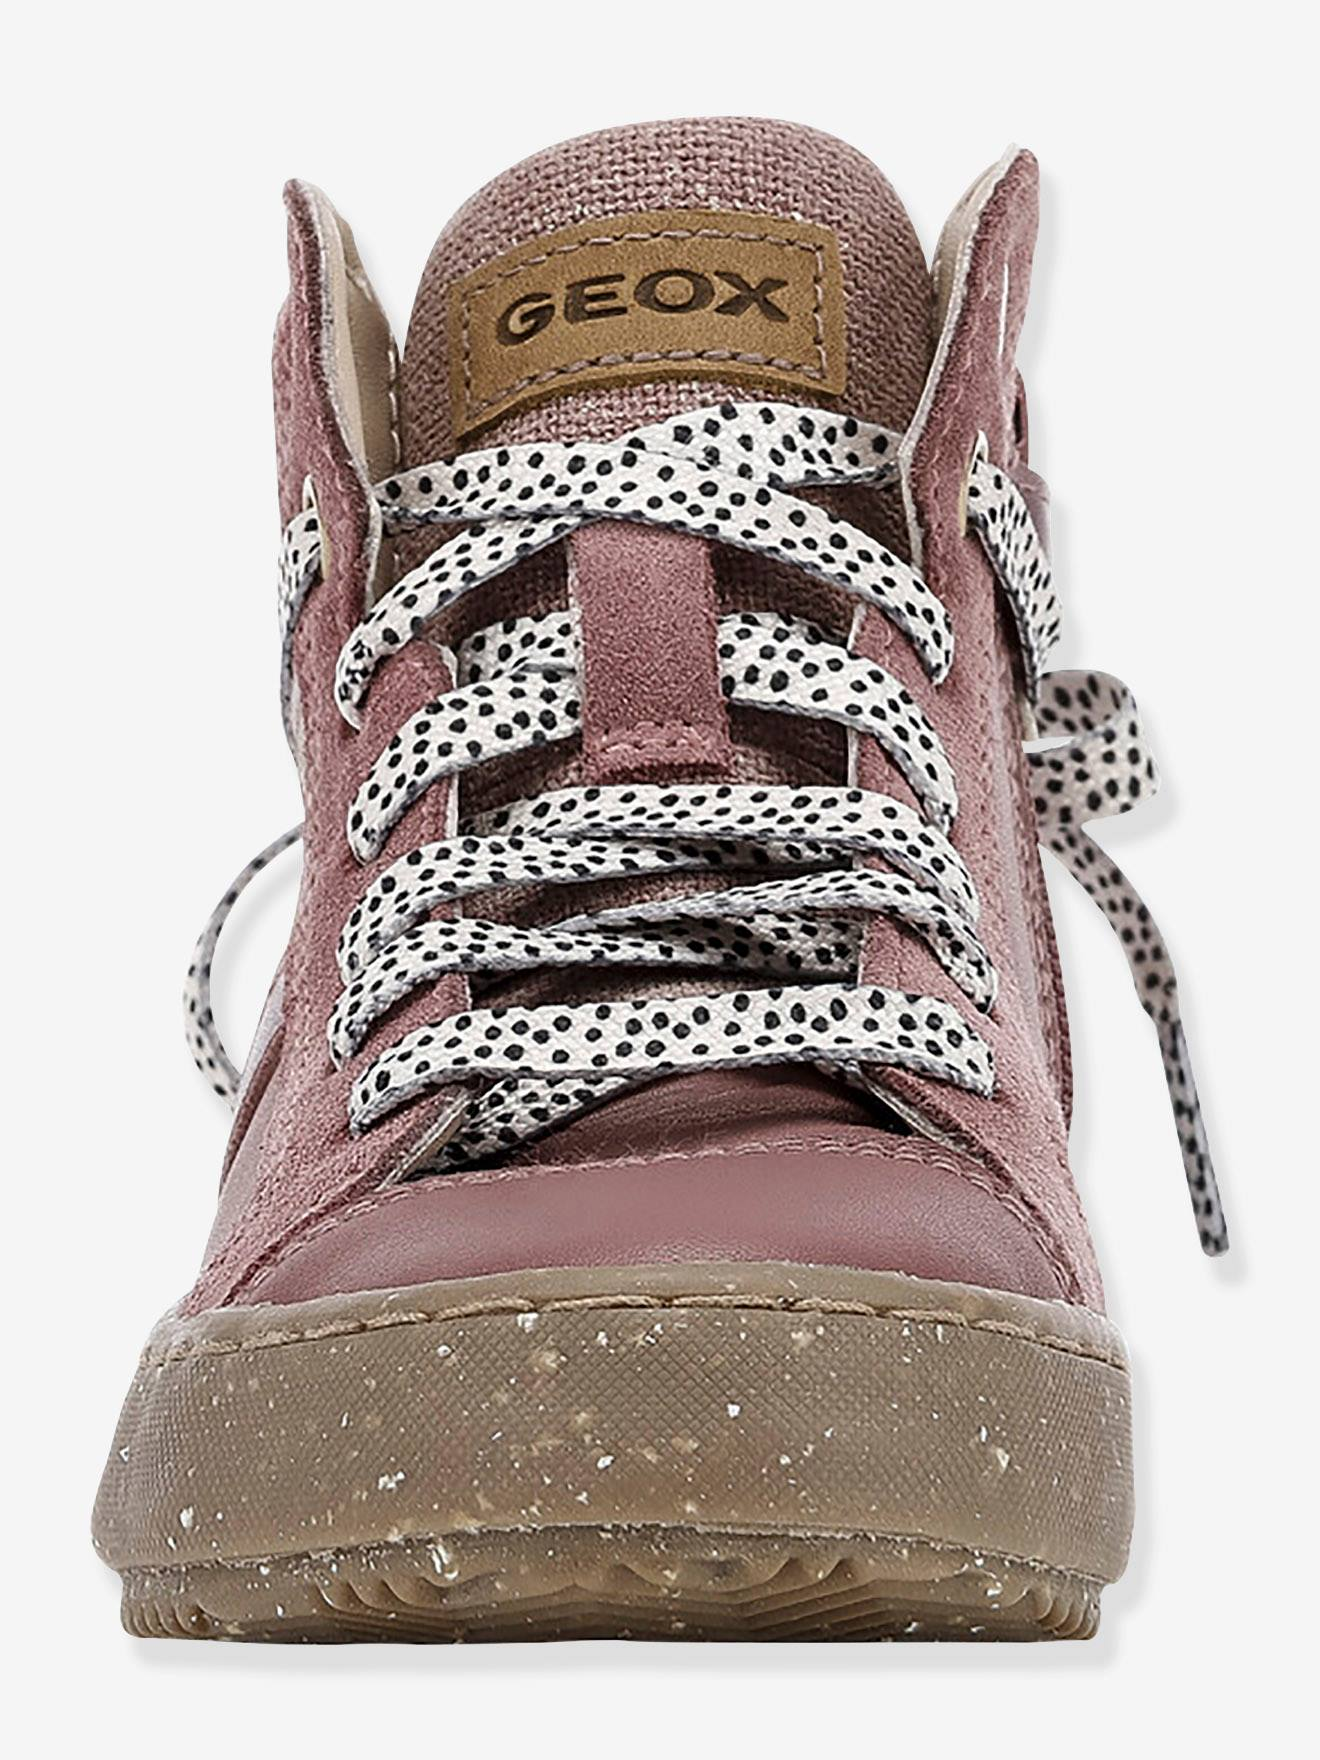 Baskets Mid fille Kalispera Girl I WWF GEOX® gris fume GEOX